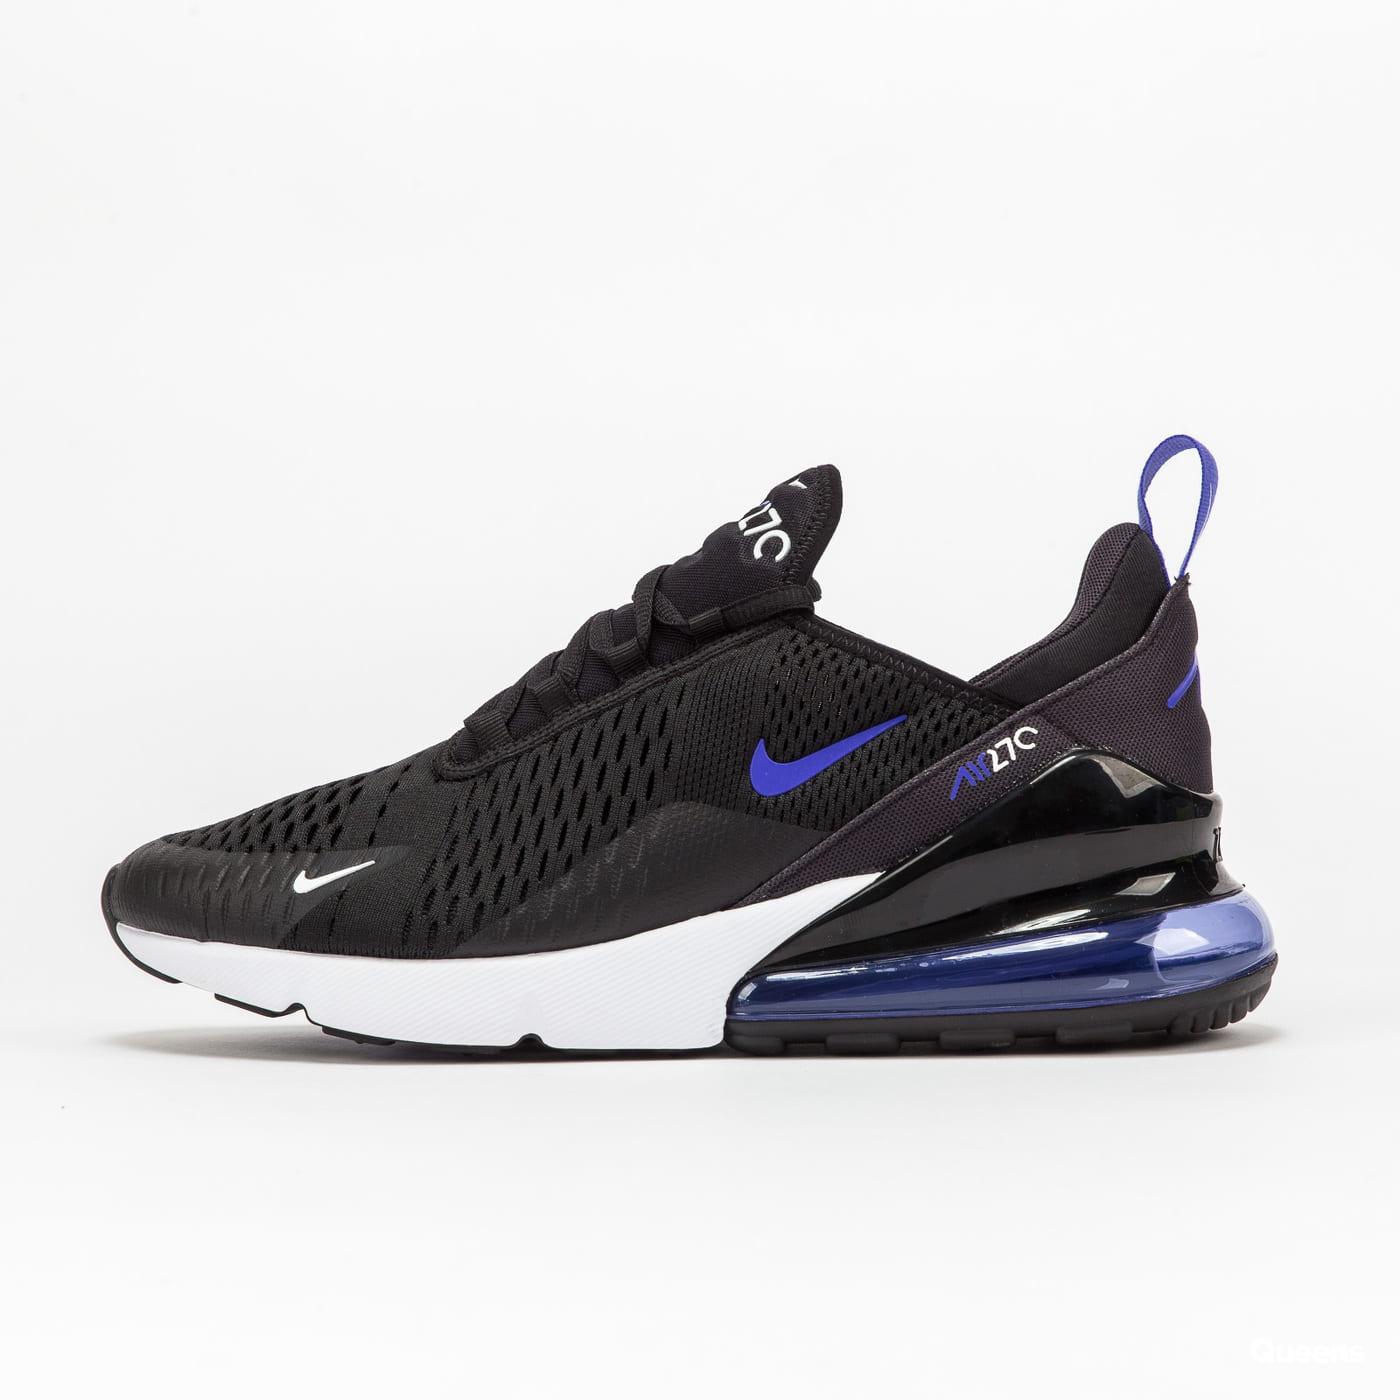 Nike Air Max 270 Essential black / persian violet - white